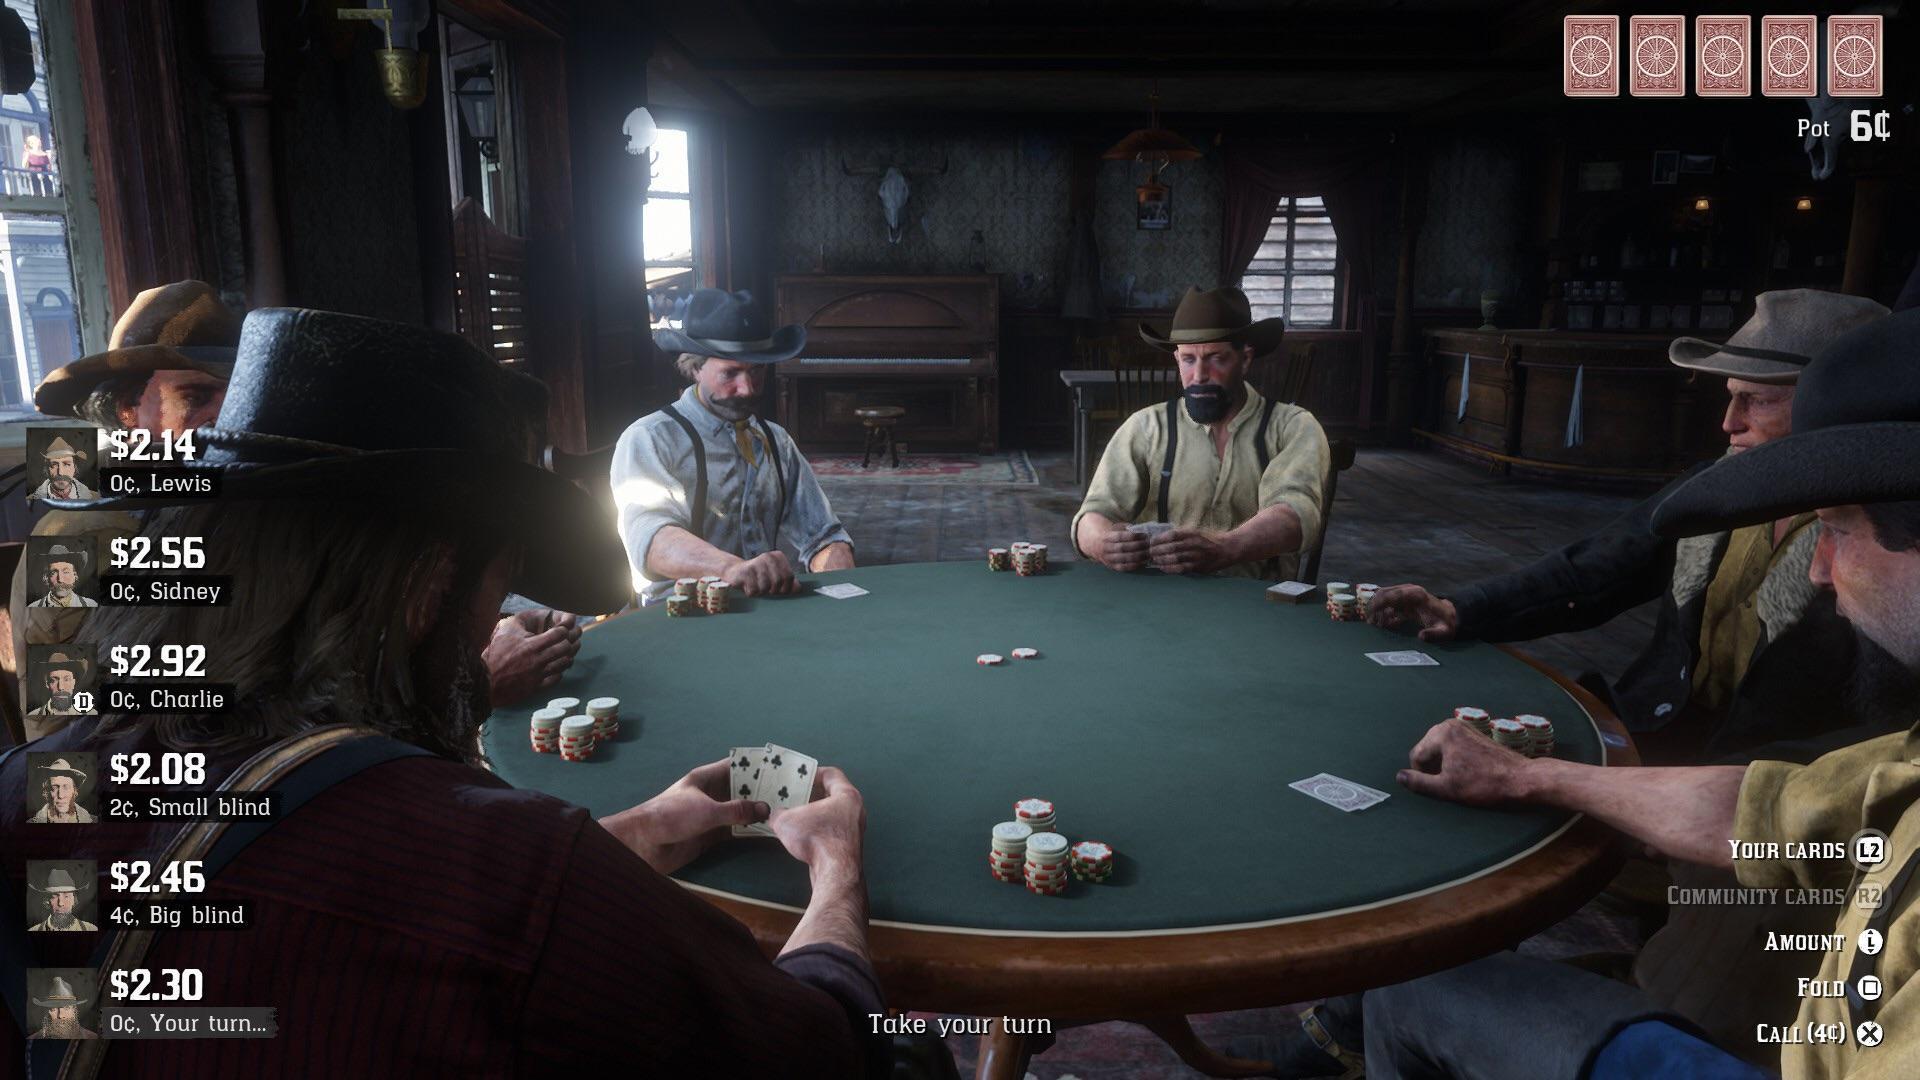 Red Dead Redemption 2 poker guide